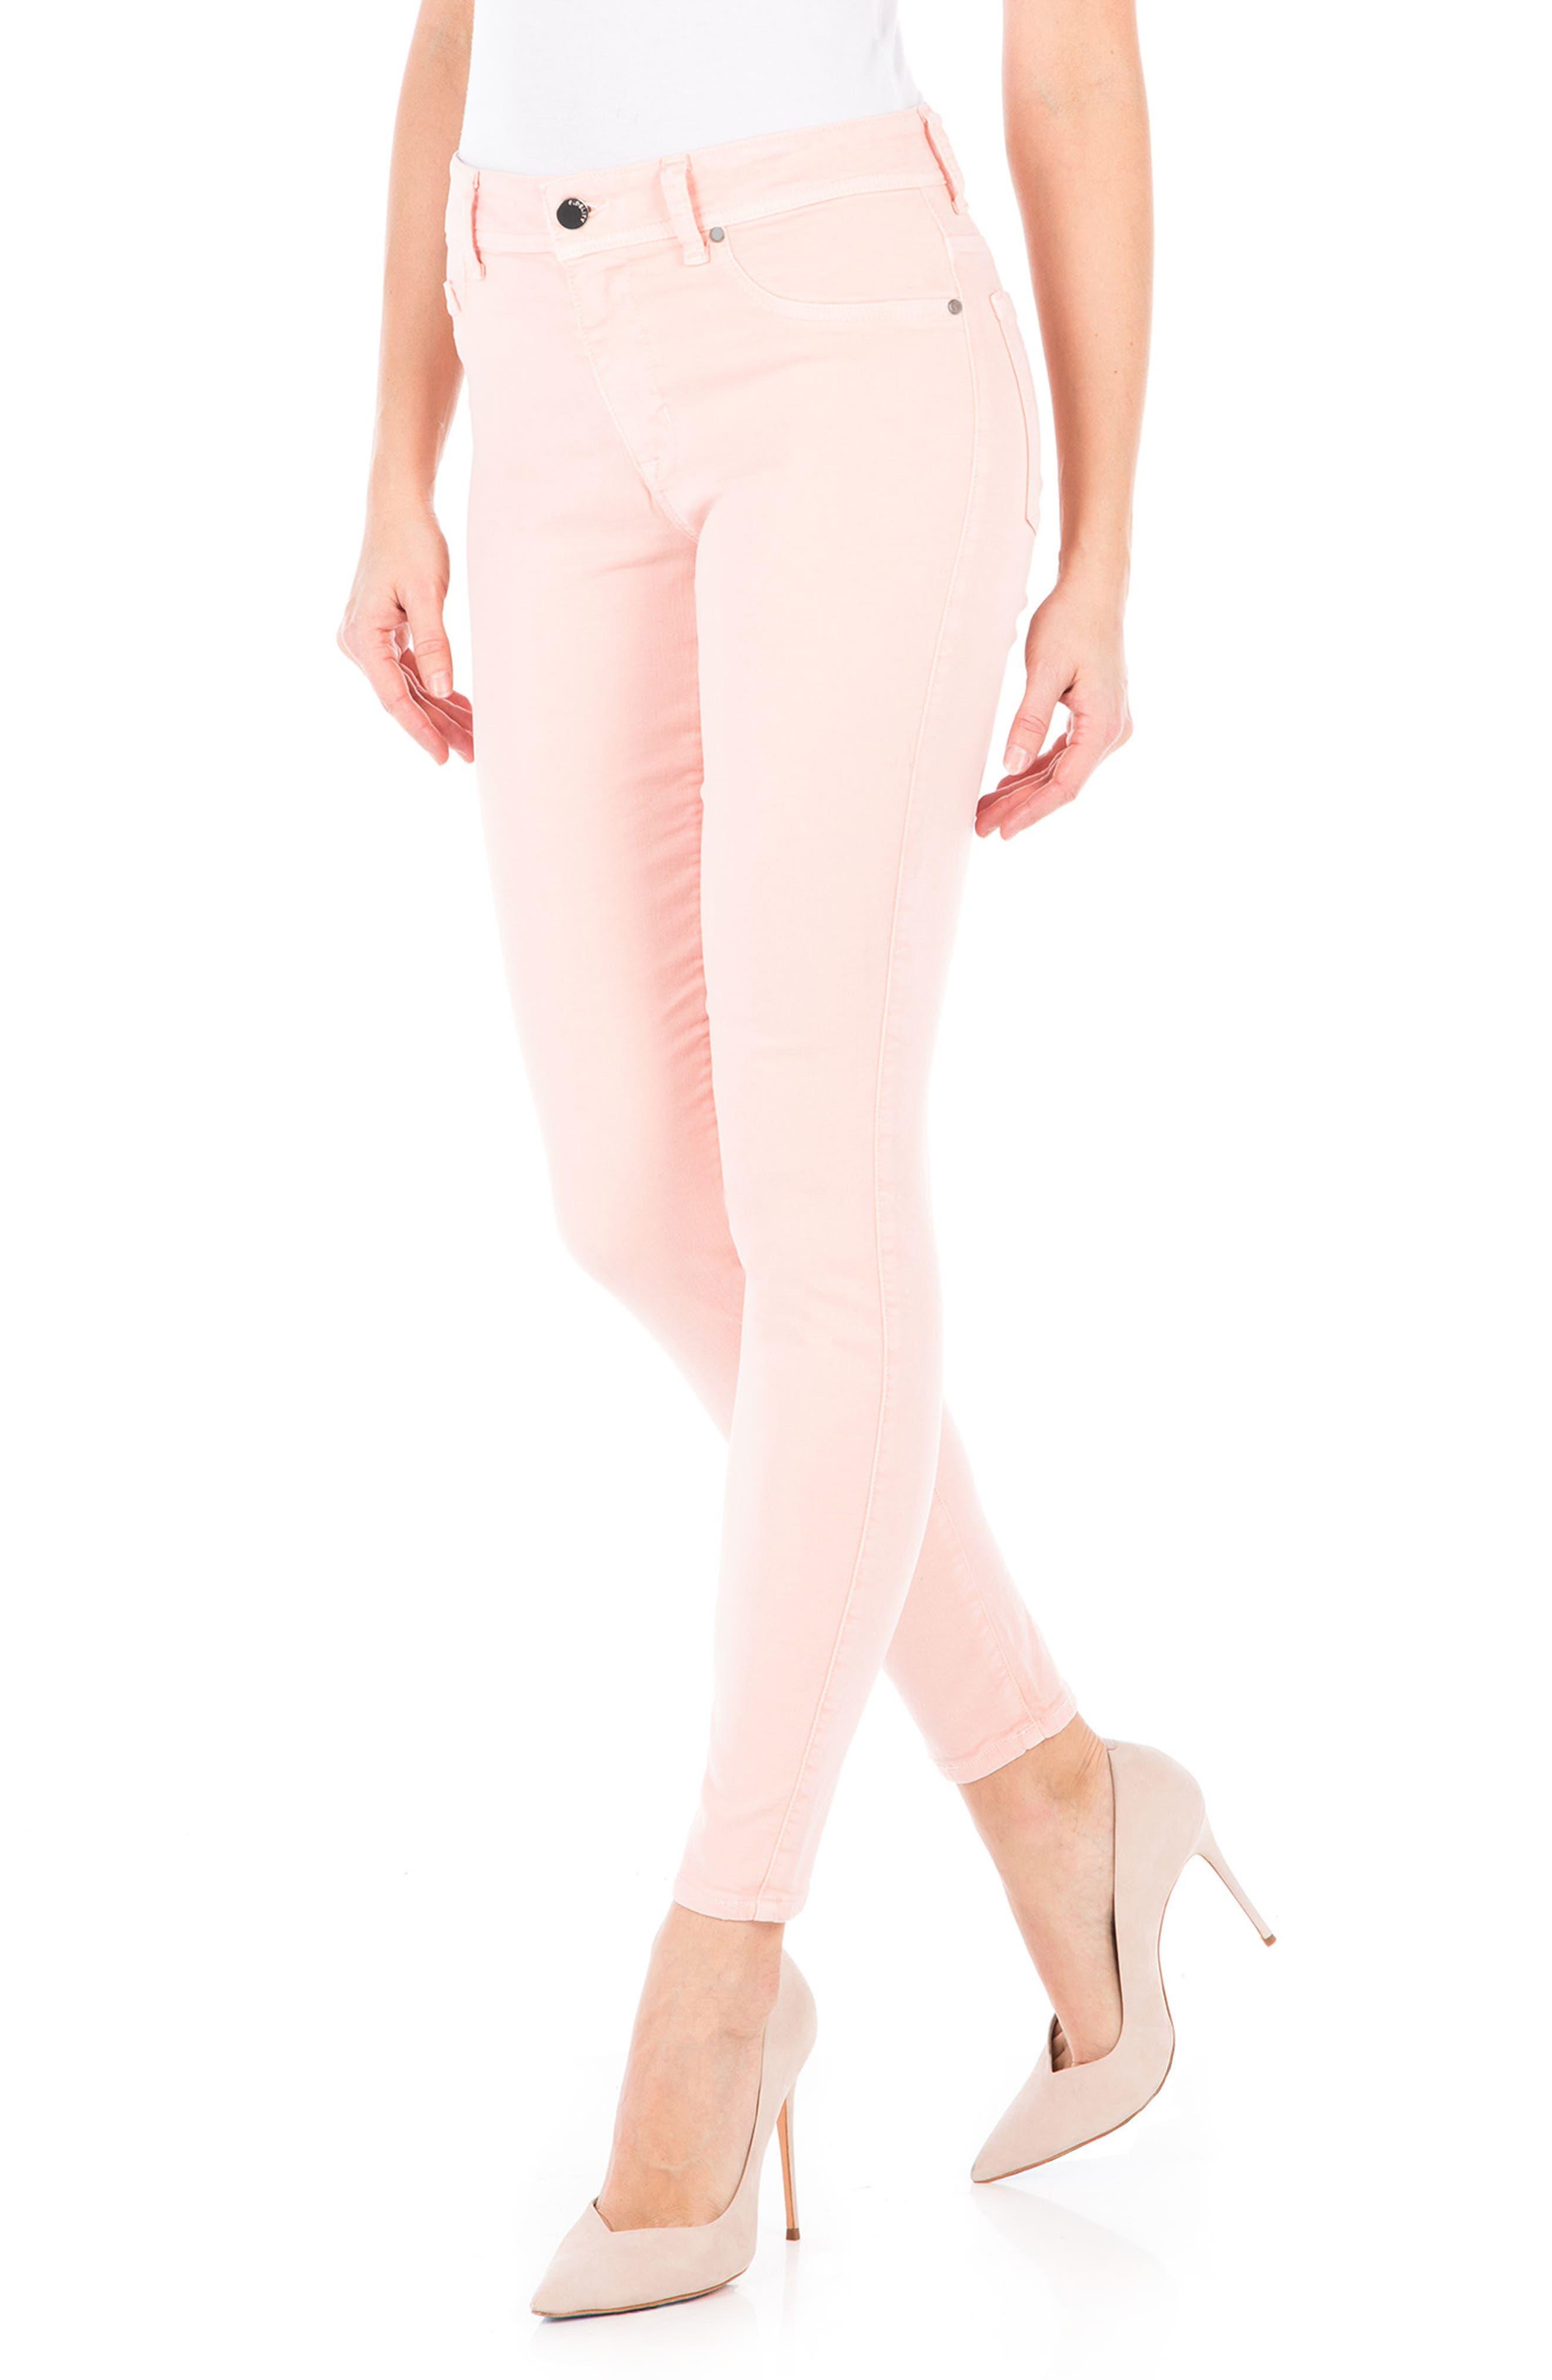 Sola Skinny Jeans,                             Alternate thumbnail 3, color,                             650